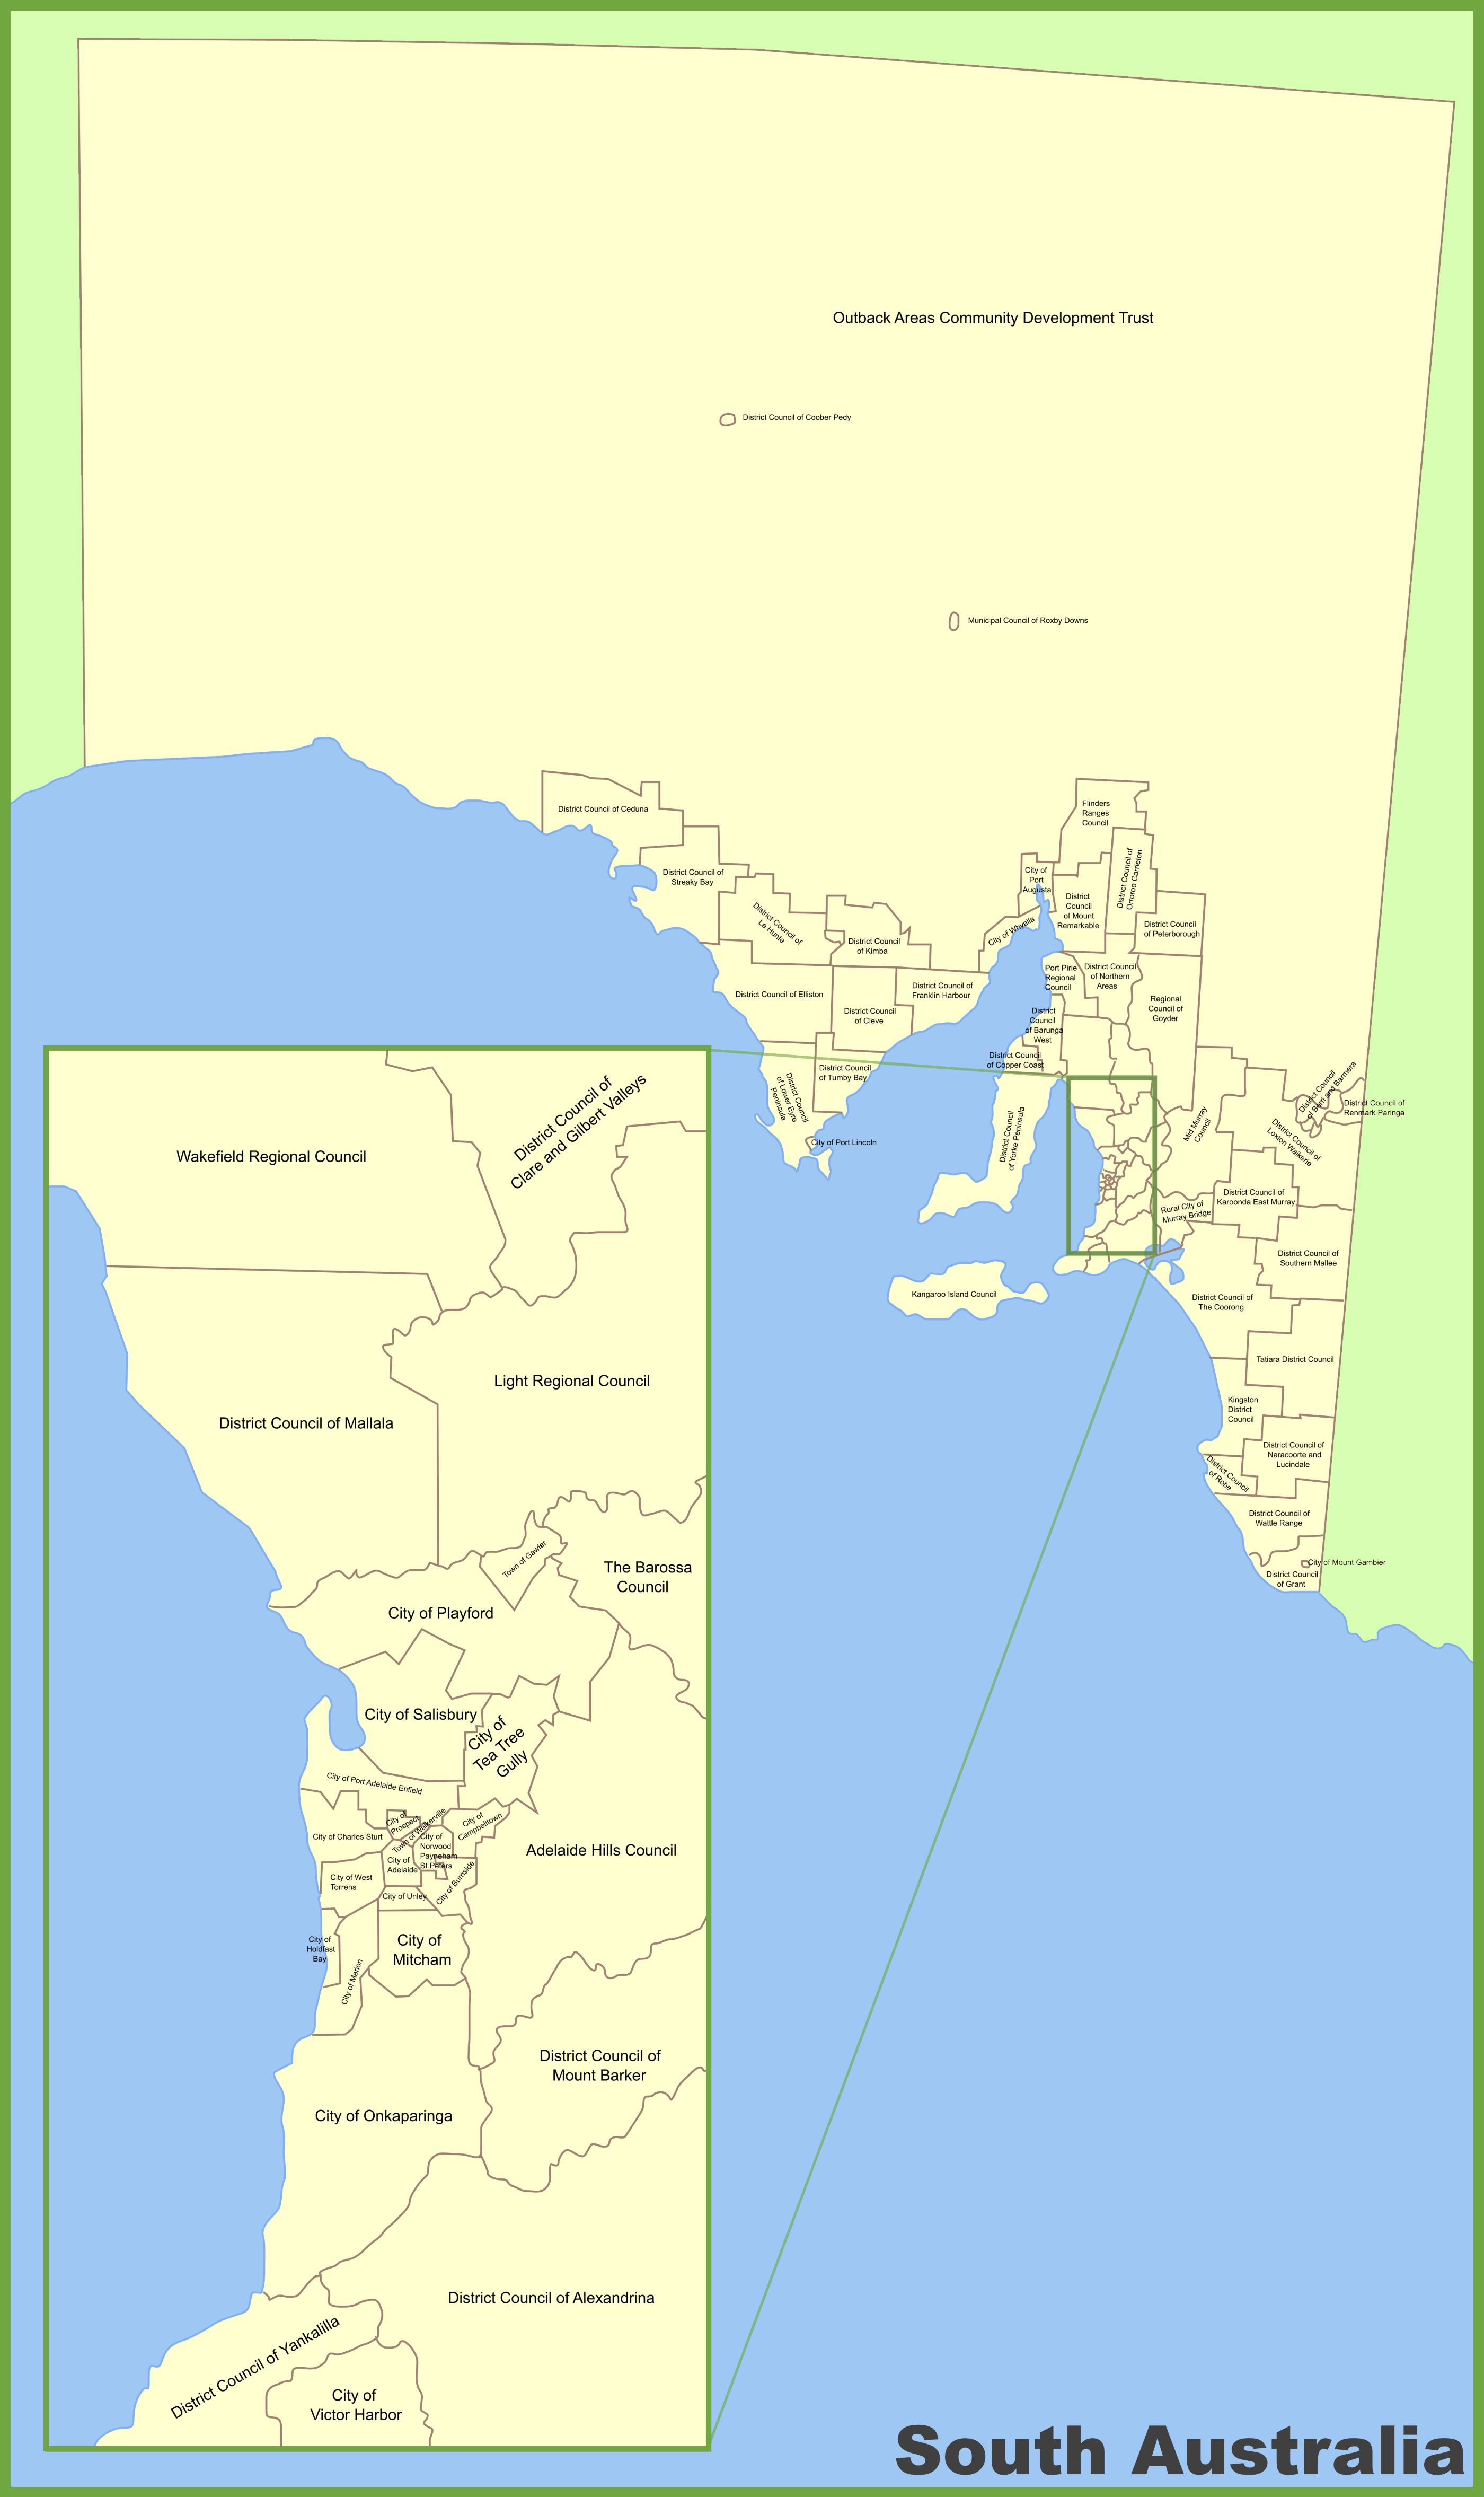 south australia local government area map